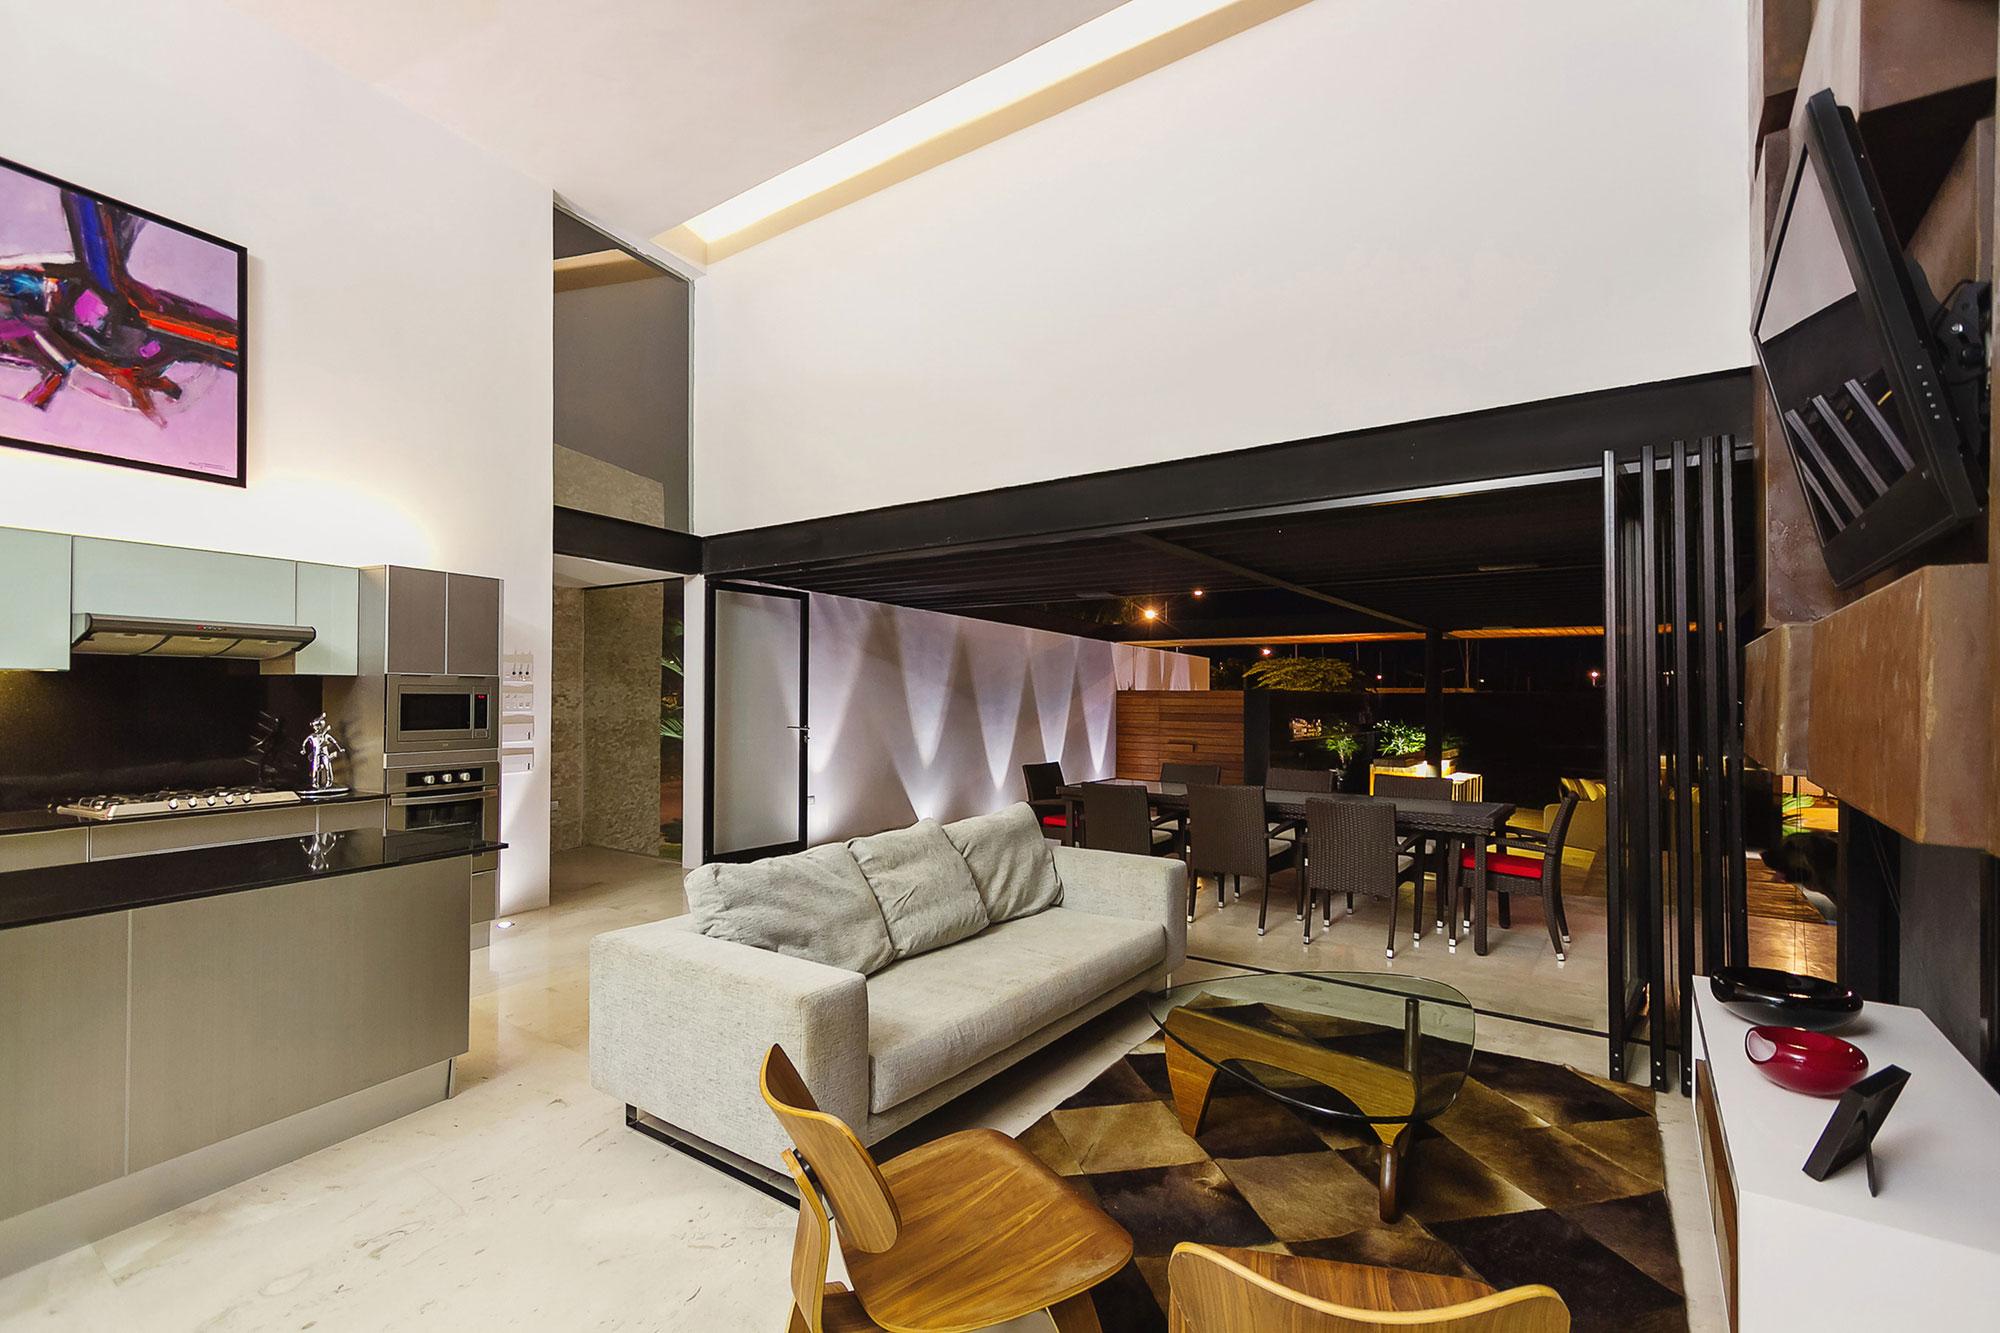 Sofa, Living Room, Glass Sliding Doors, Contemporary Residence in Merida, Yucatan